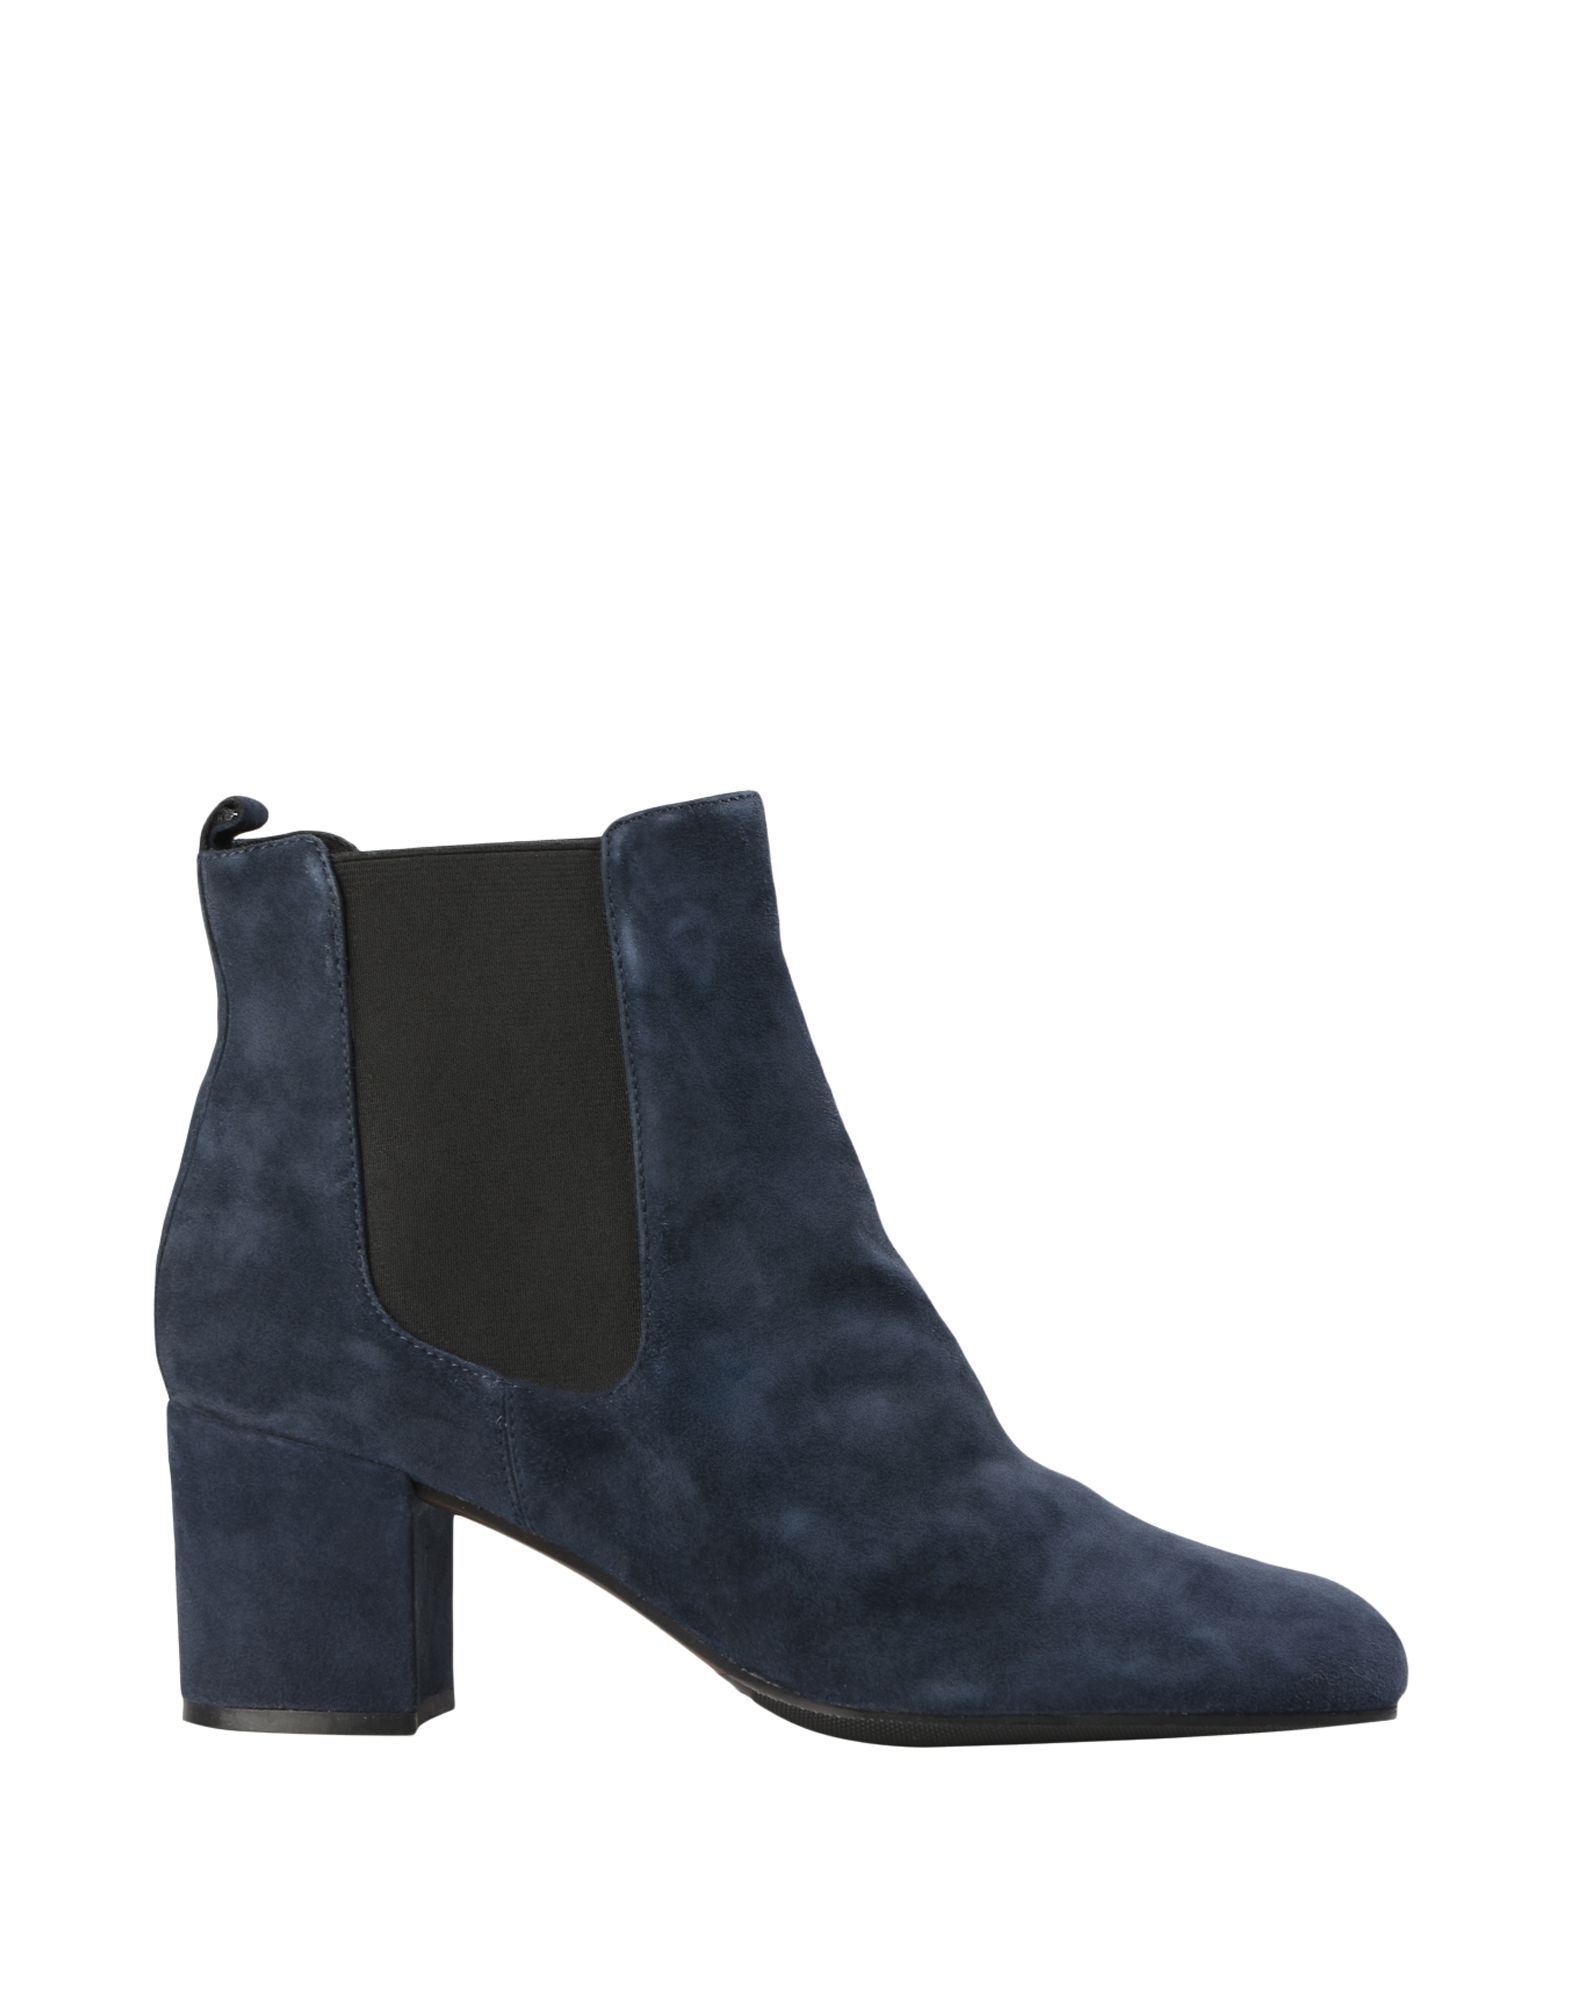 Gut um Premi billige Schuhe zu tragenBruno Premi um Chelsea Boots Damen  11403791XM 462b13